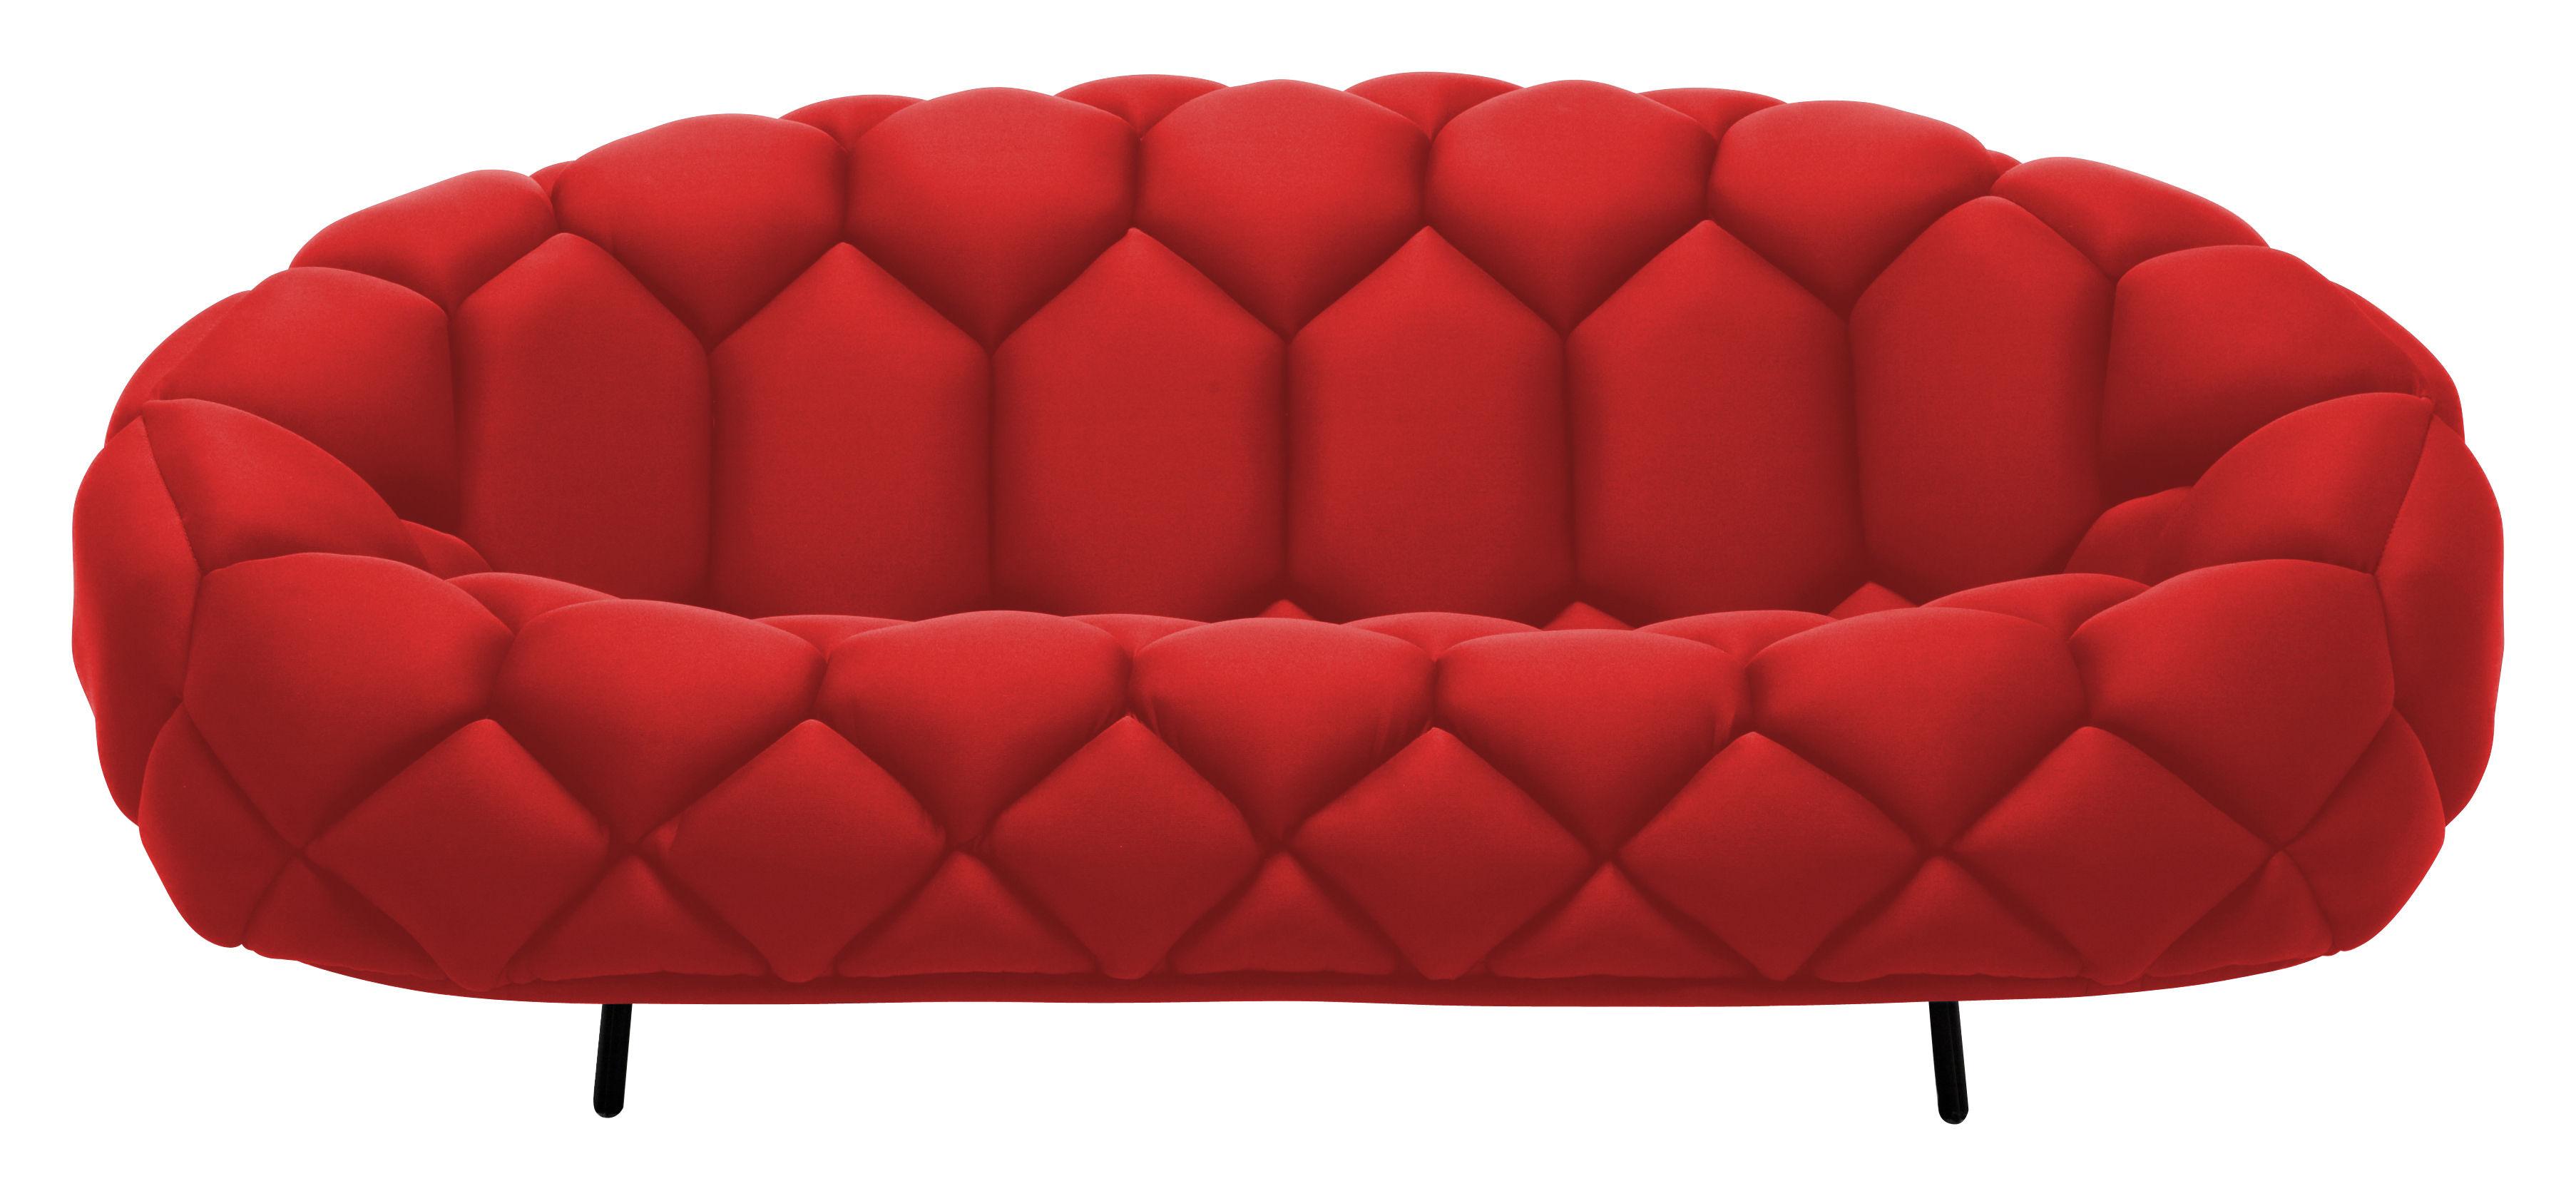 canap droit quilt l 210 cm rouge established sons. Black Bedroom Furniture Sets. Home Design Ideas